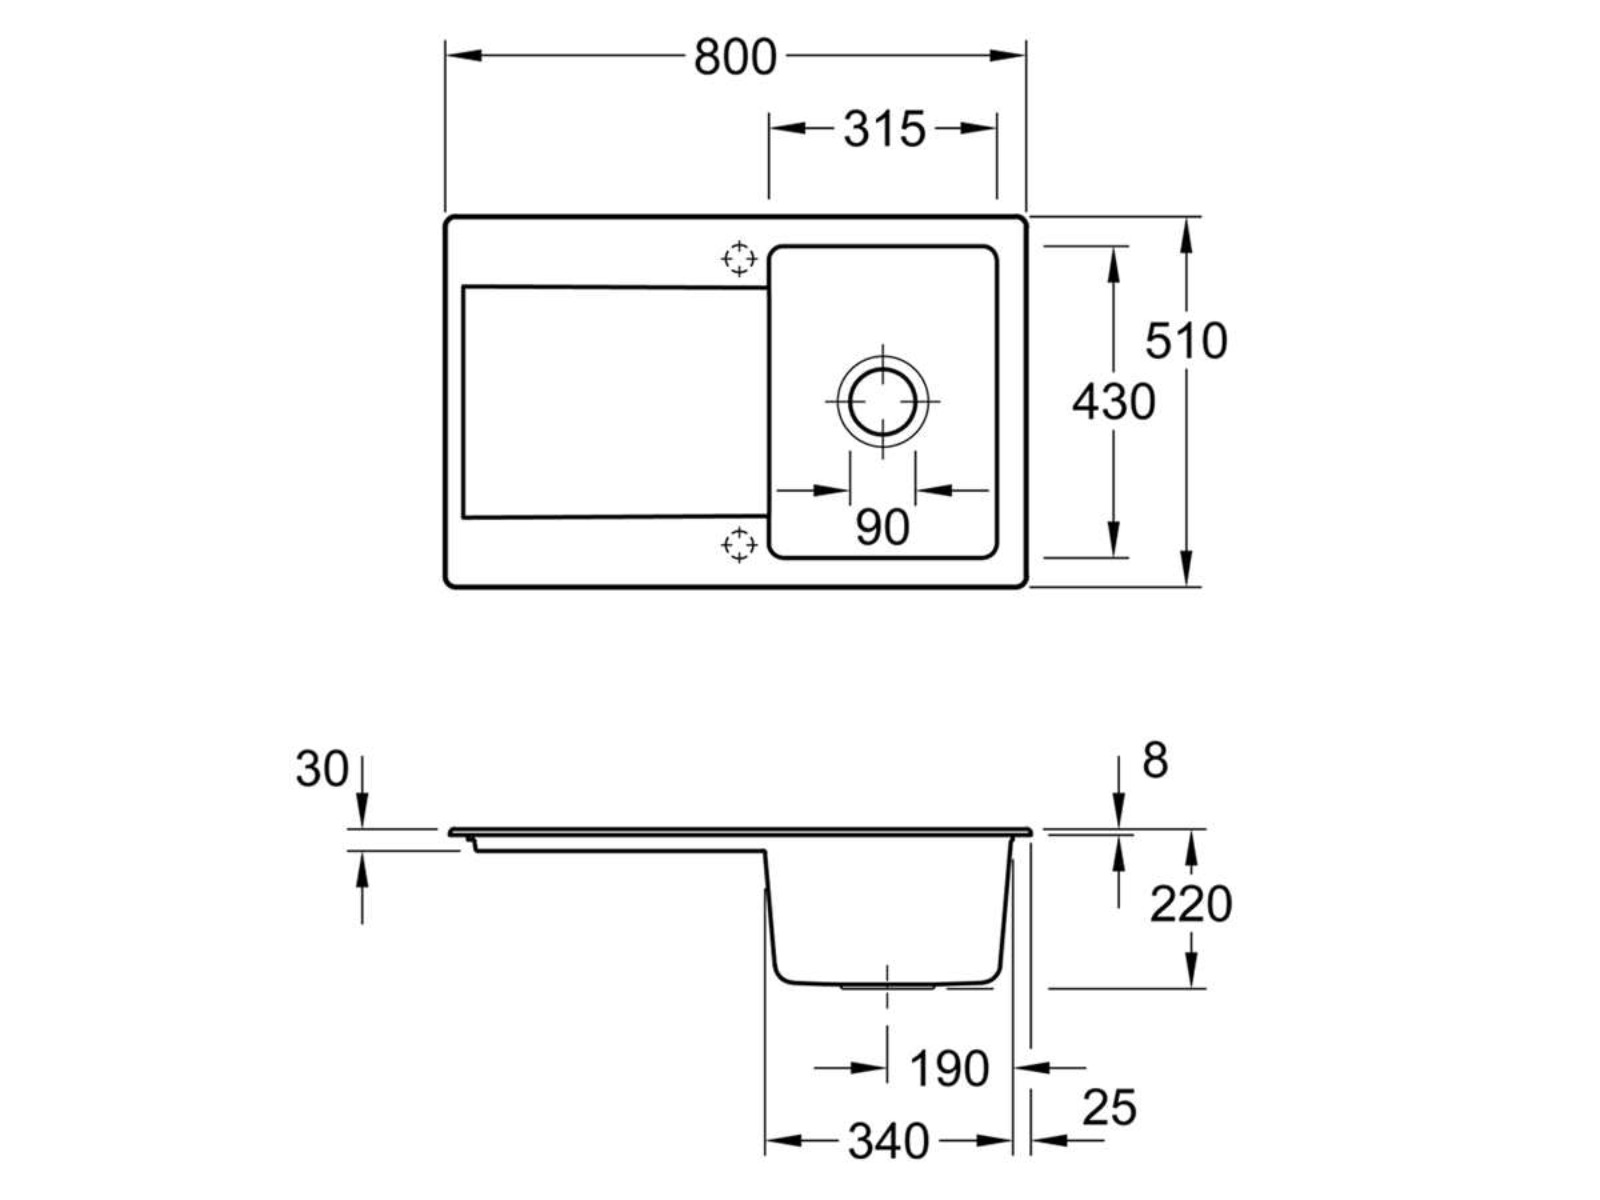 Villeroy & Boch Siluet 45 - 3334 01 AM Almond Keramikspüle Handbetätigung